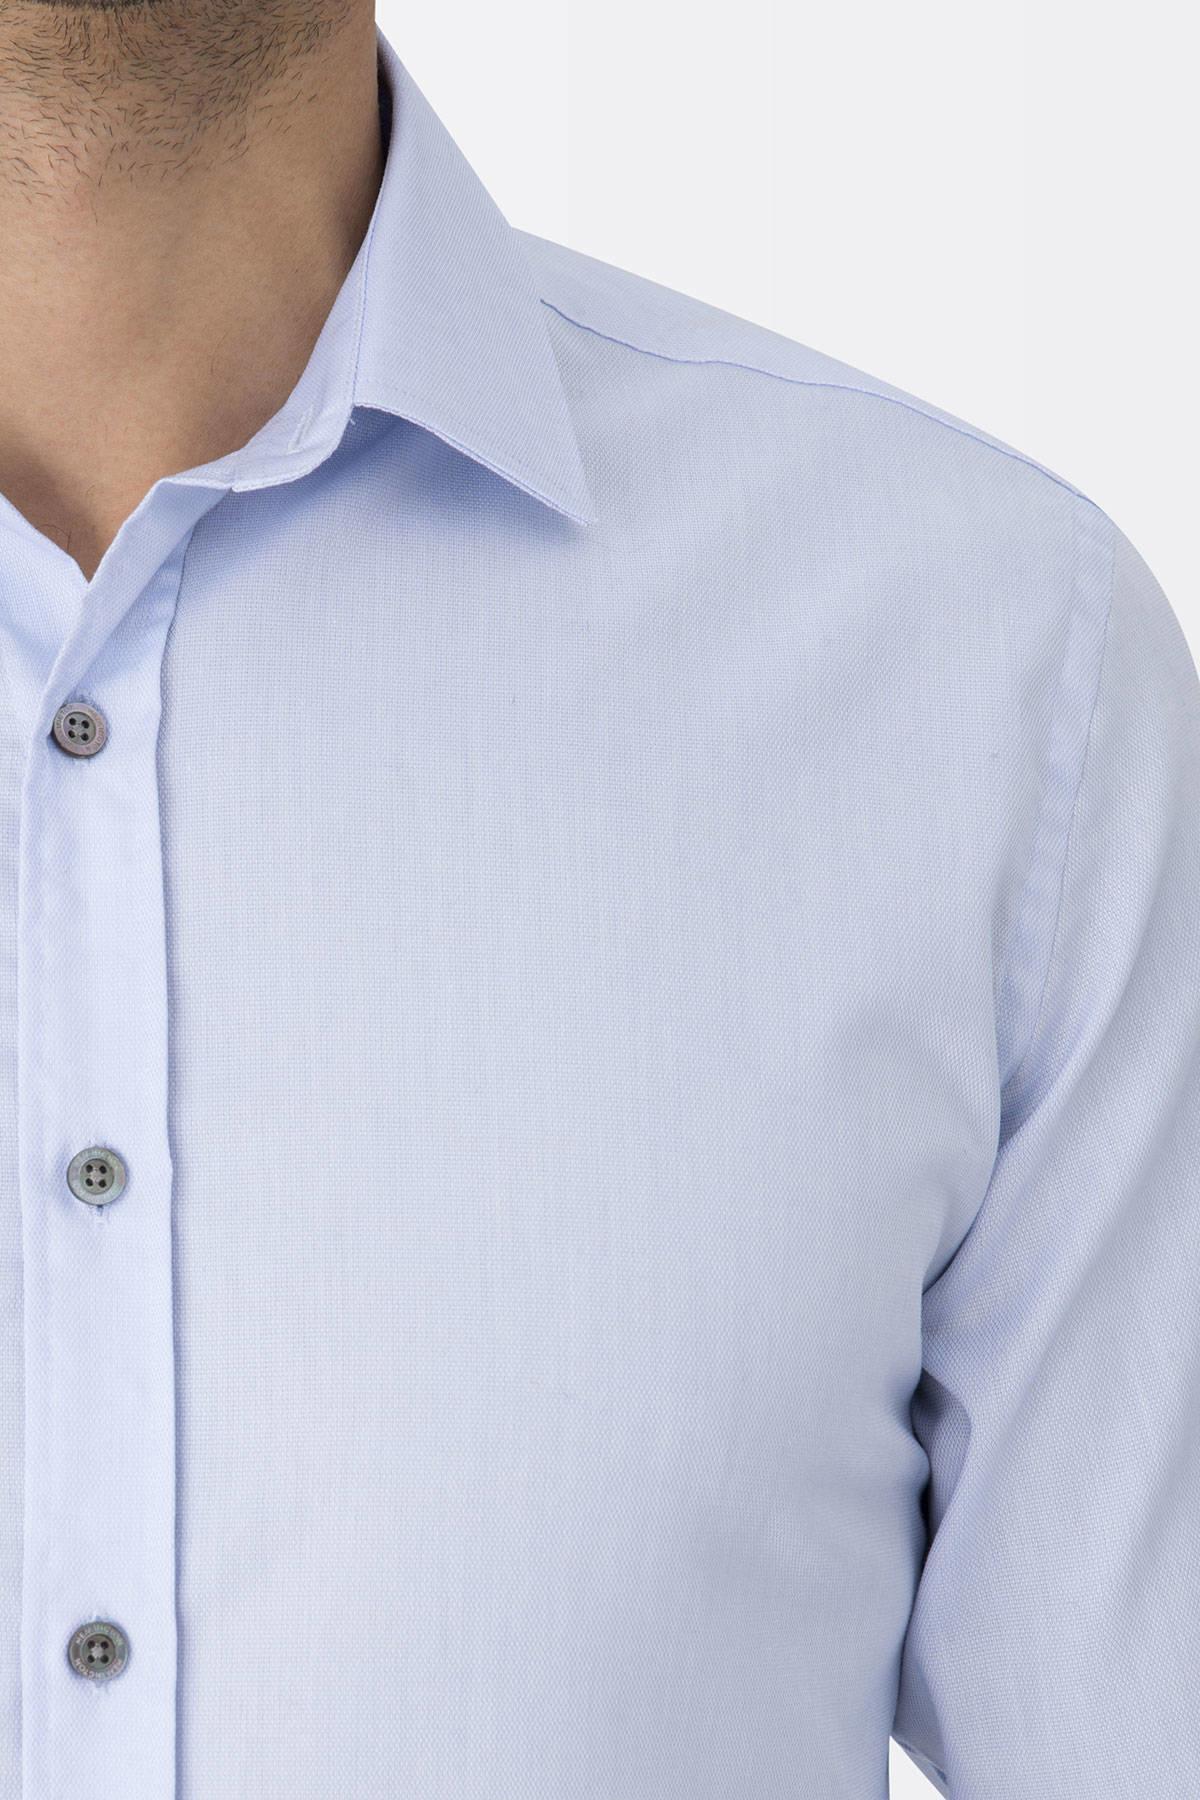 Mavi Non-Iron Business Gömlek